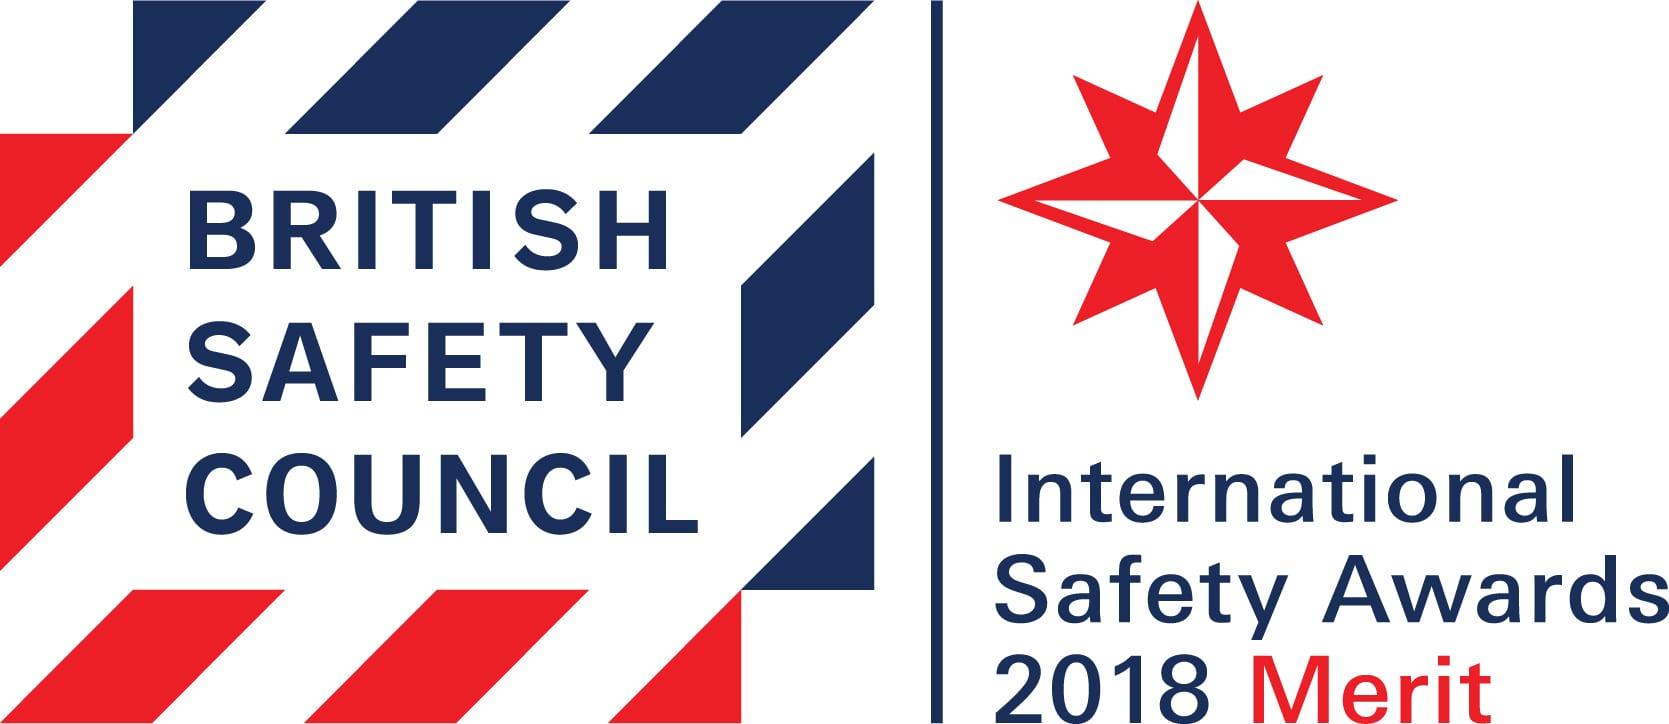 British Safety Council International H&S Award - Merit